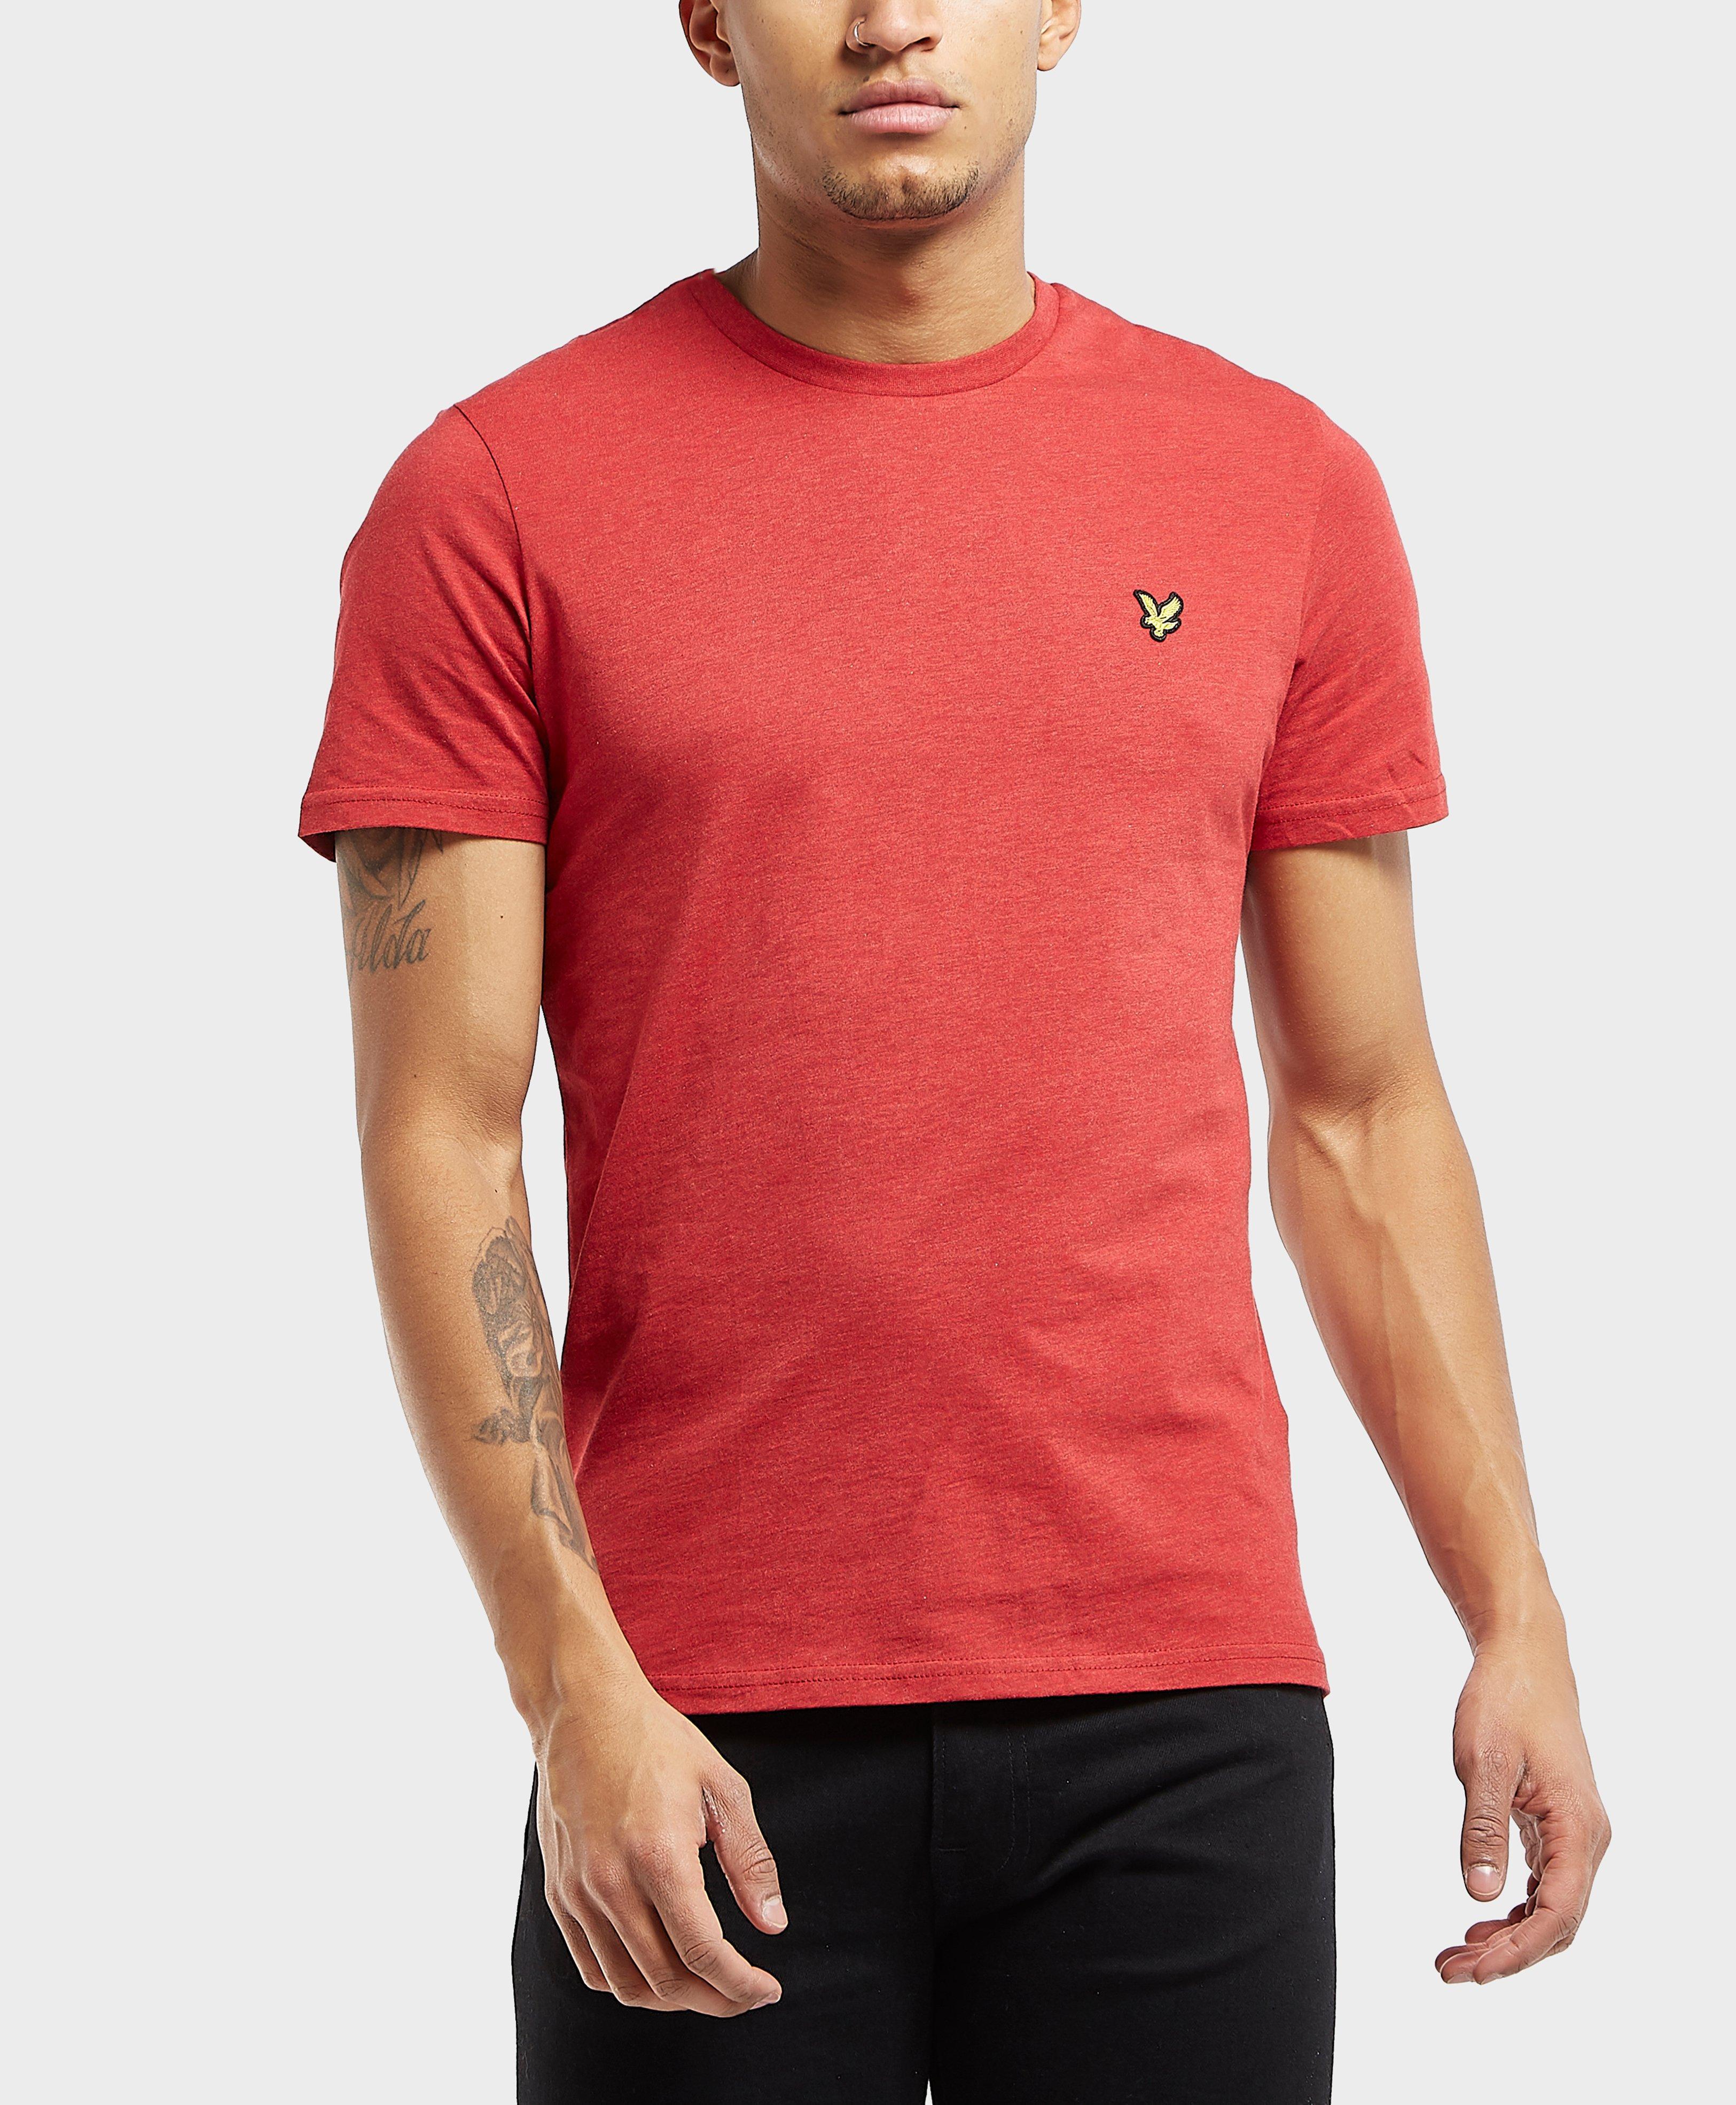 986514d65 Lyst - Lyle & Scott Marl Short Sleeve T-shirt in Red for Men